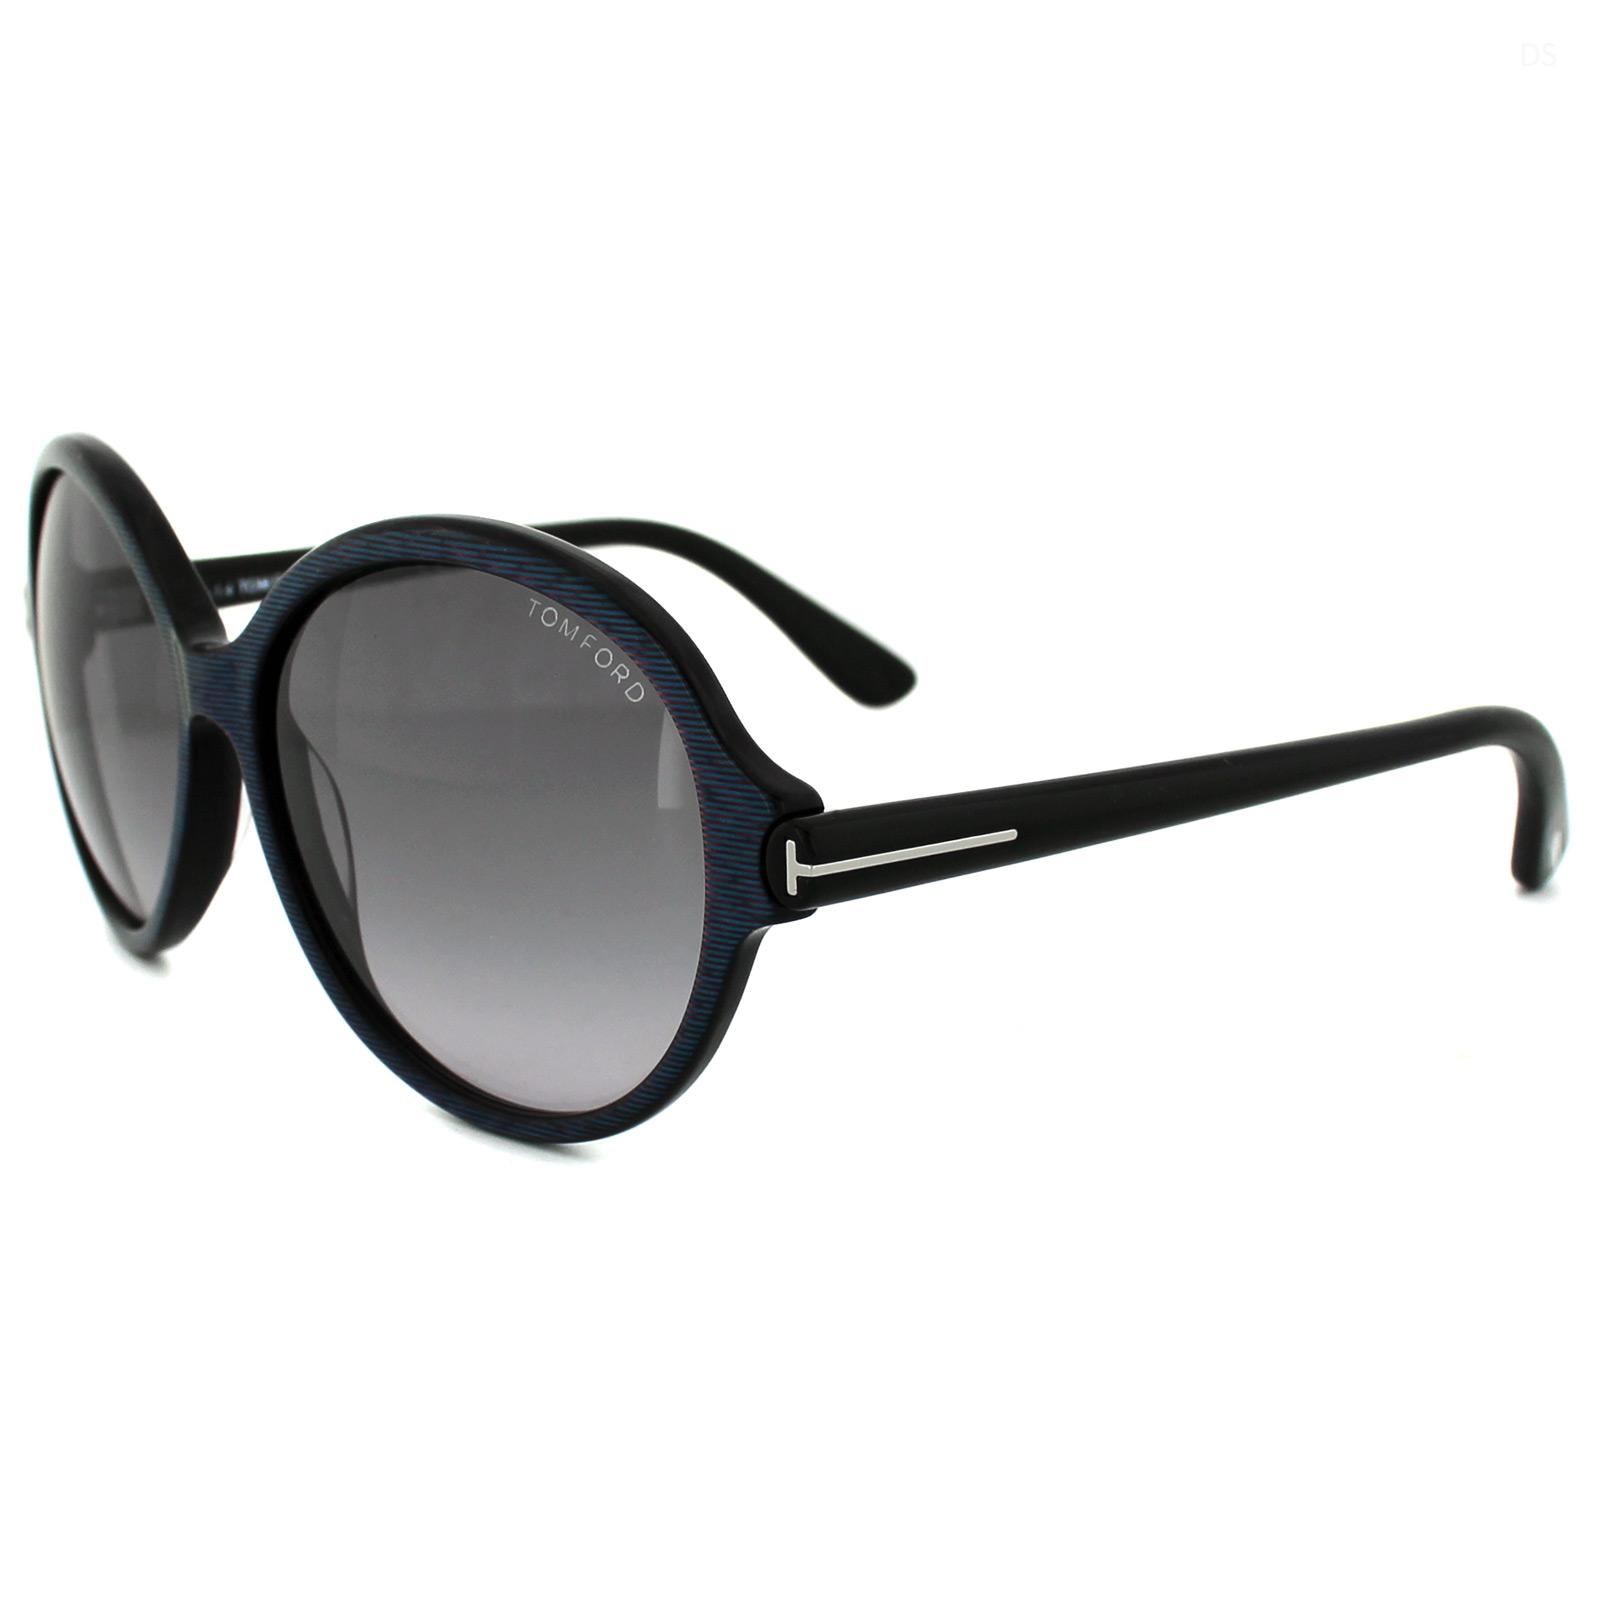 4f1a90f405dd Cheap Tom Ford Sunglasses - Discounted Sunglasses